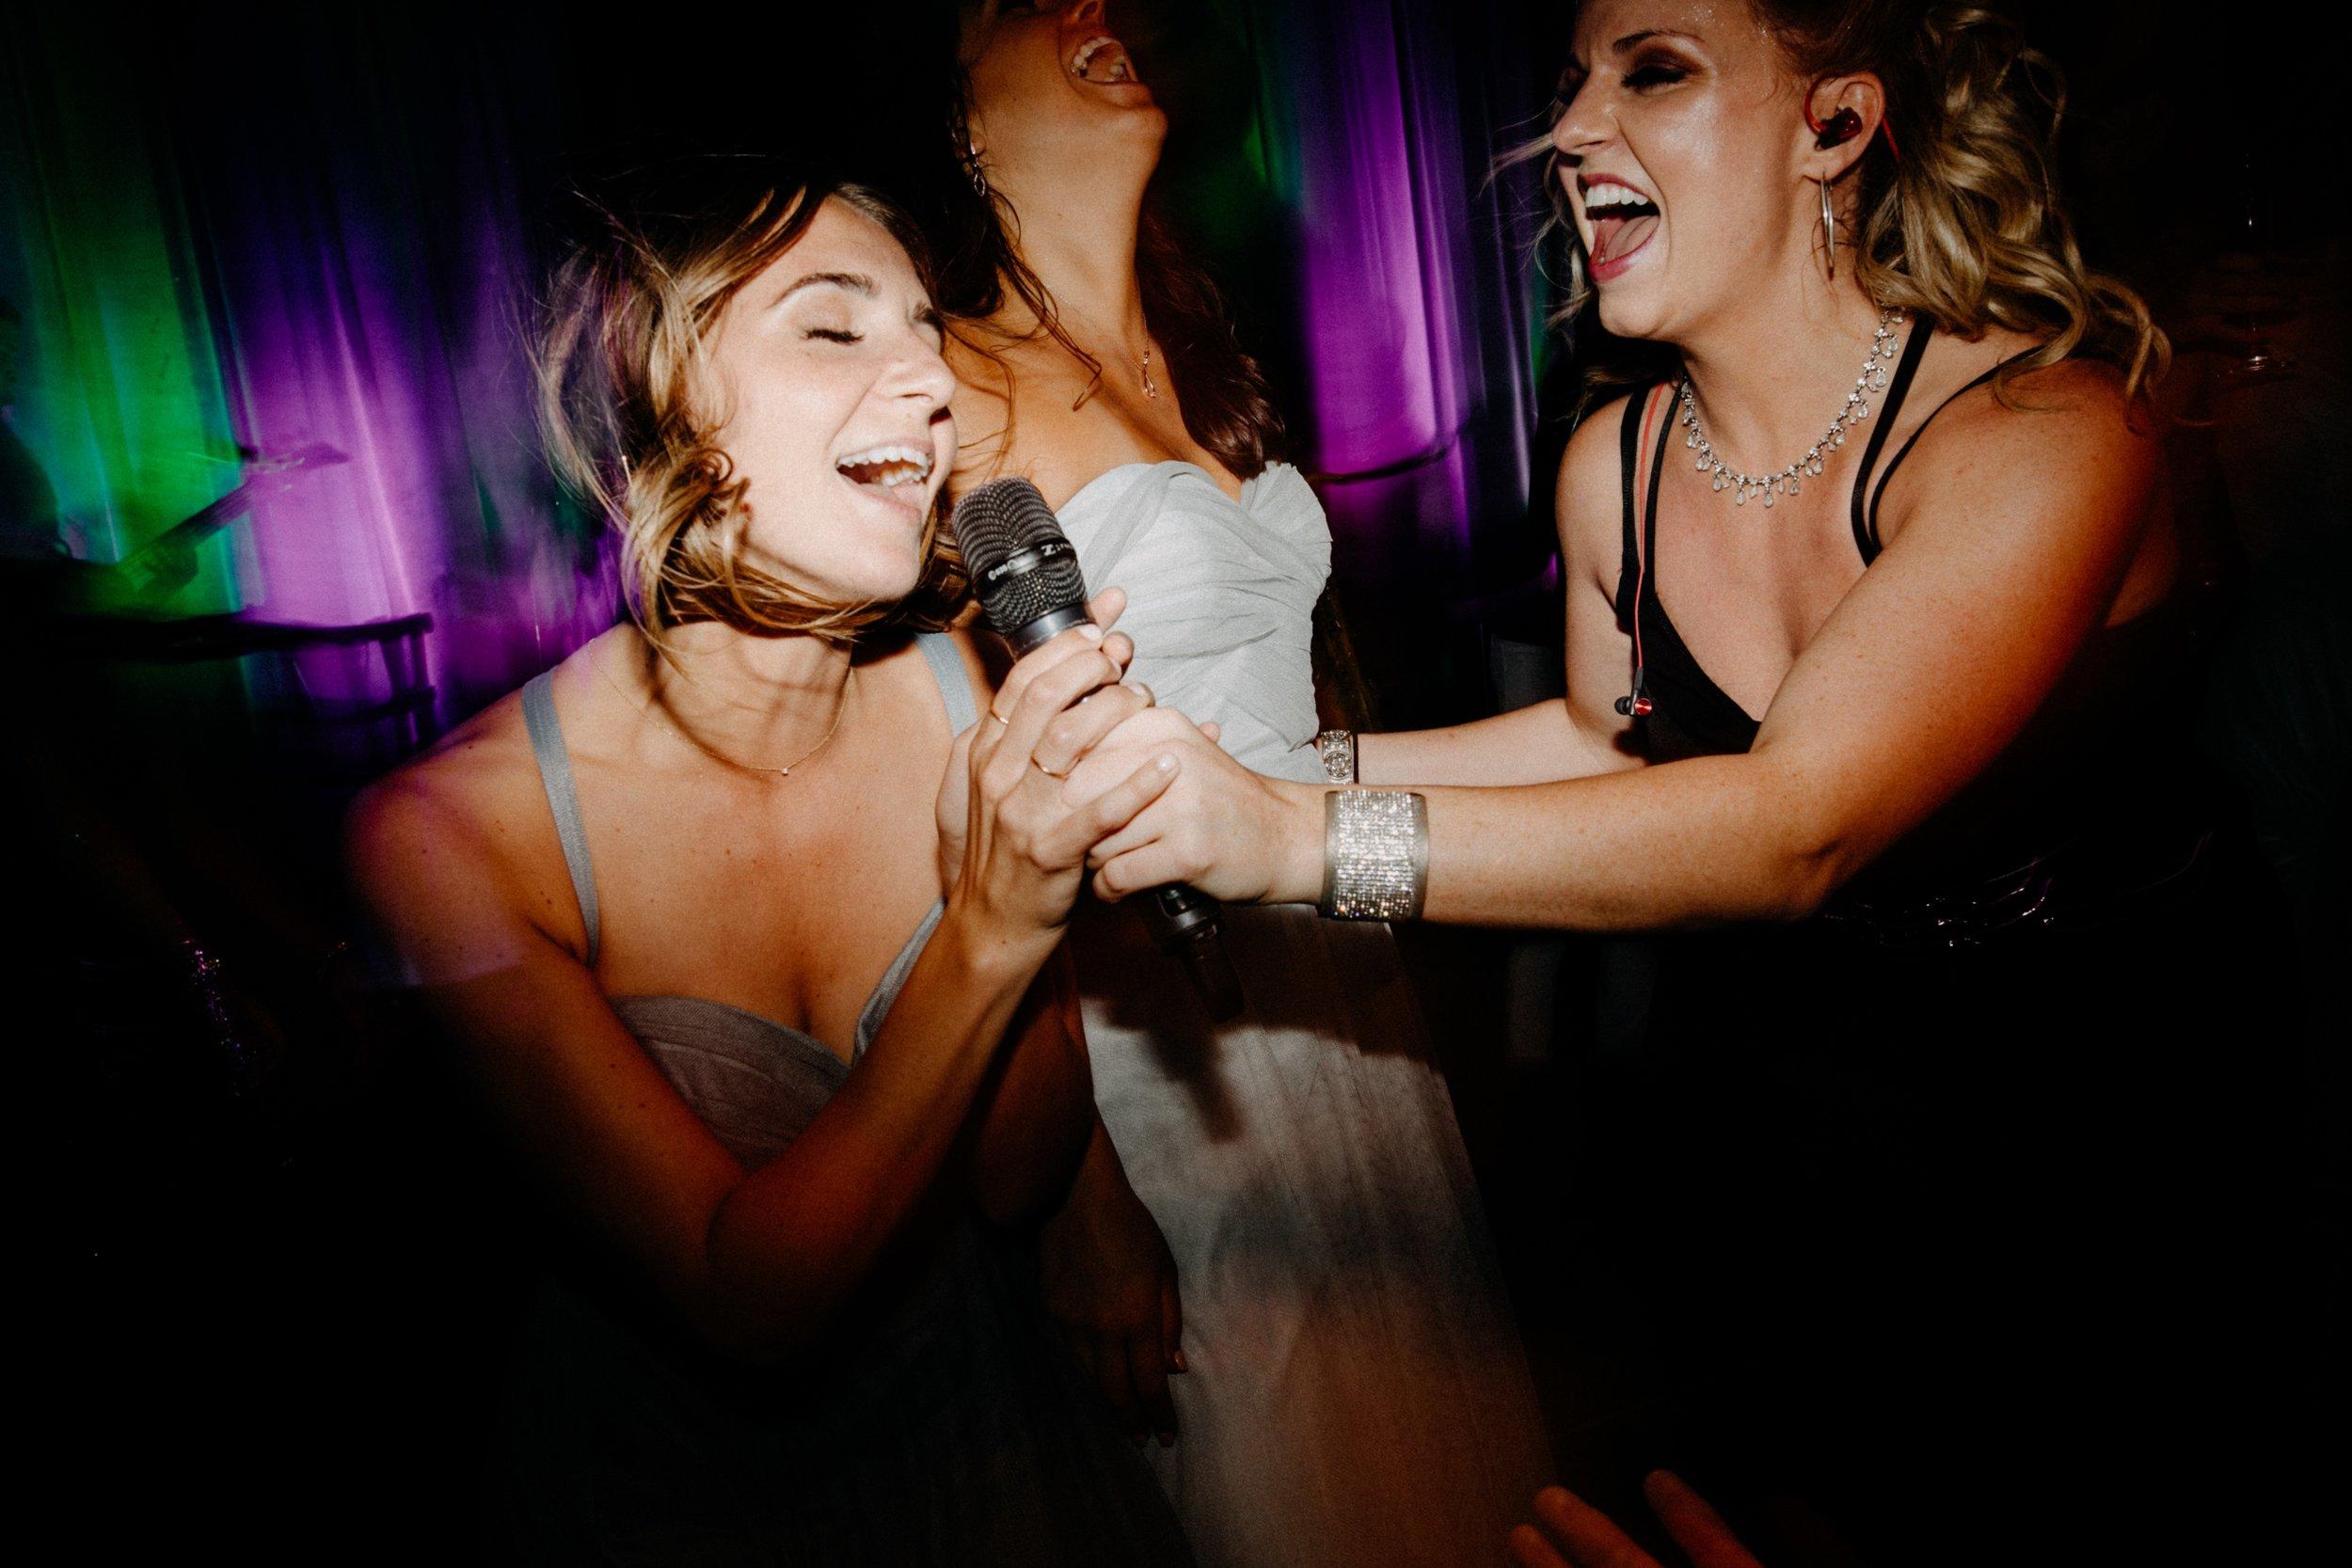 st-anthony-hotel-wedding-photography-10201san-antonio.JPG